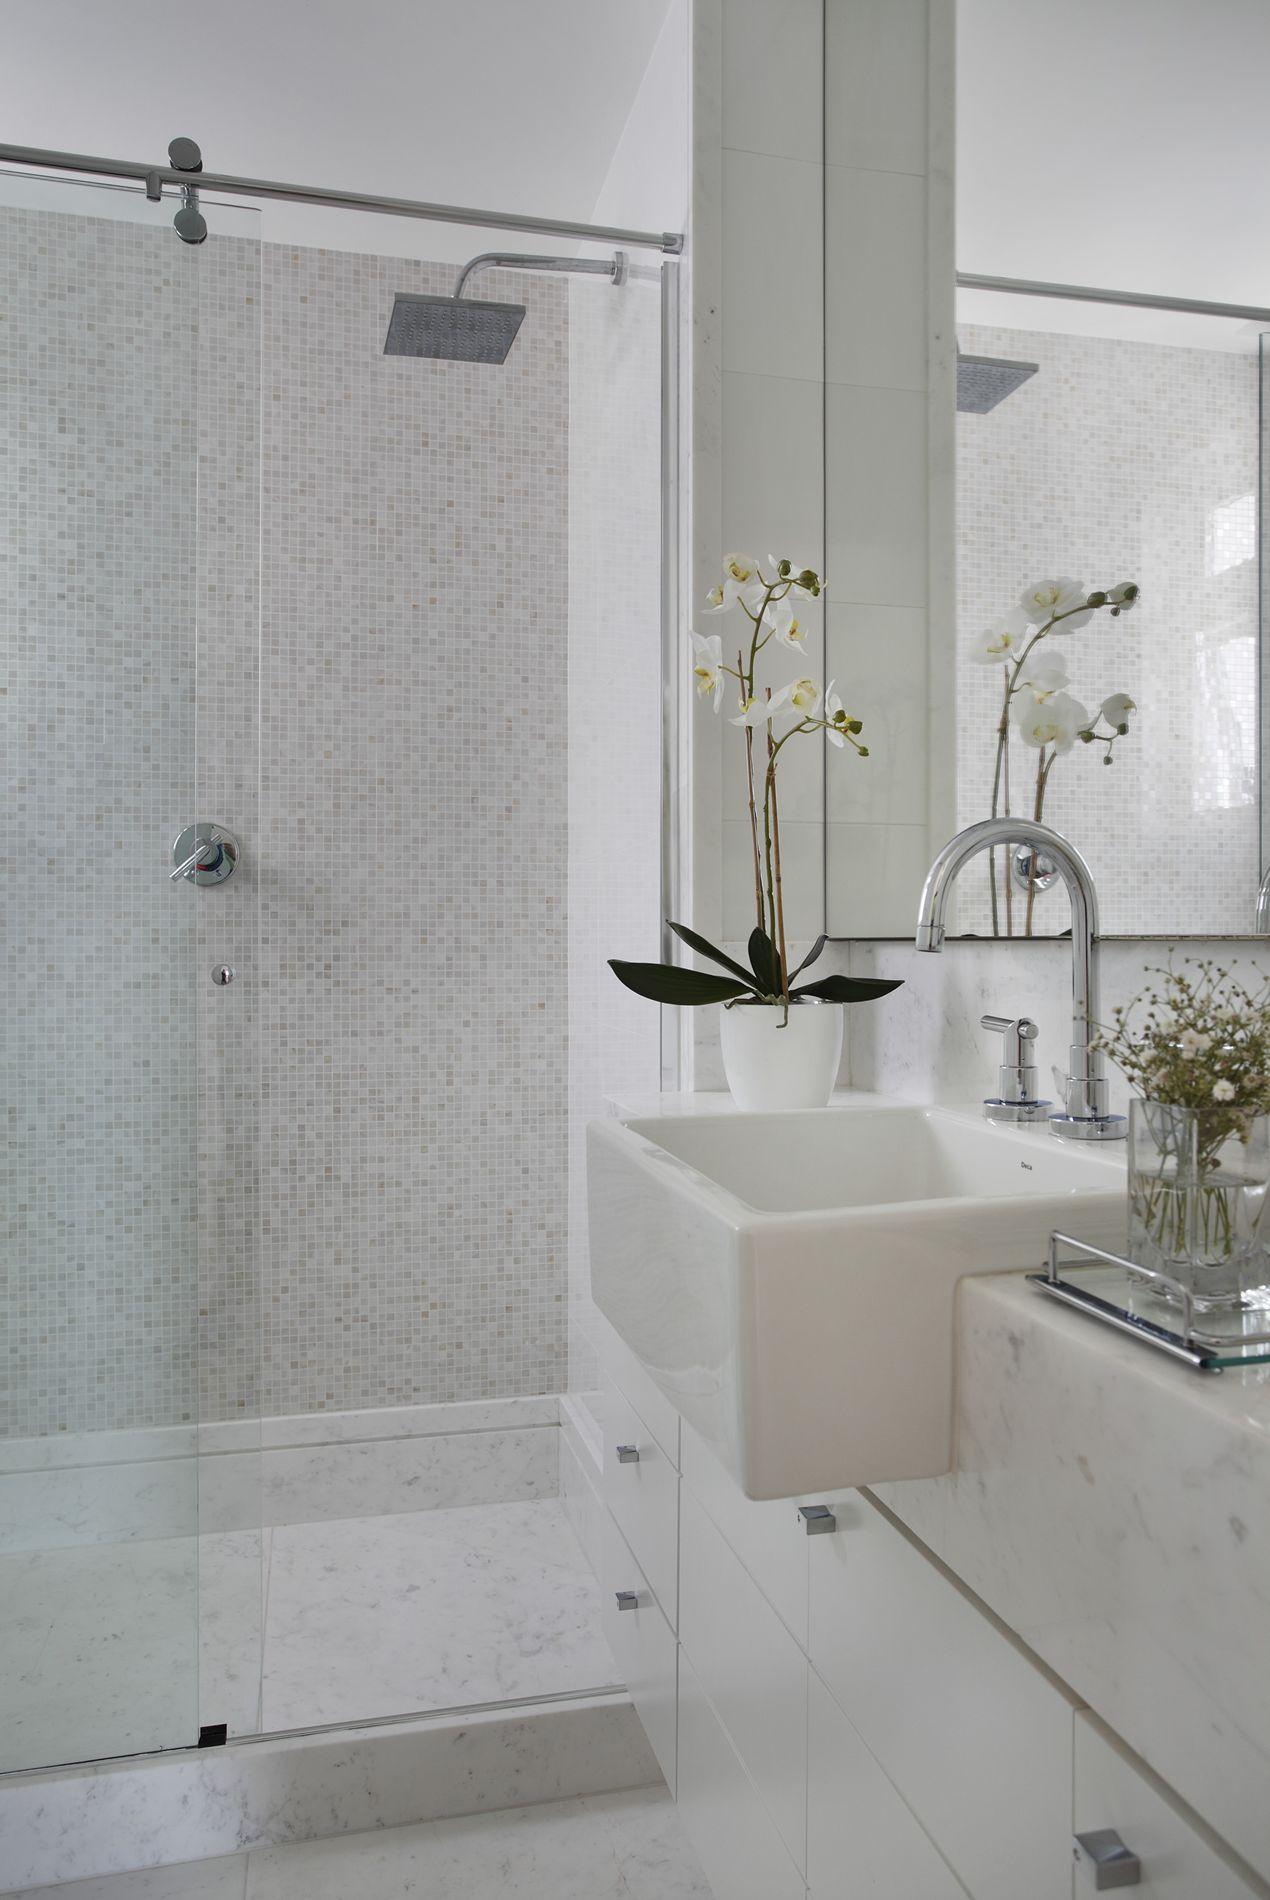 banheiros banheiros banheiros banheiros banheiros banheiros banheiros  #65614C 1270 1900